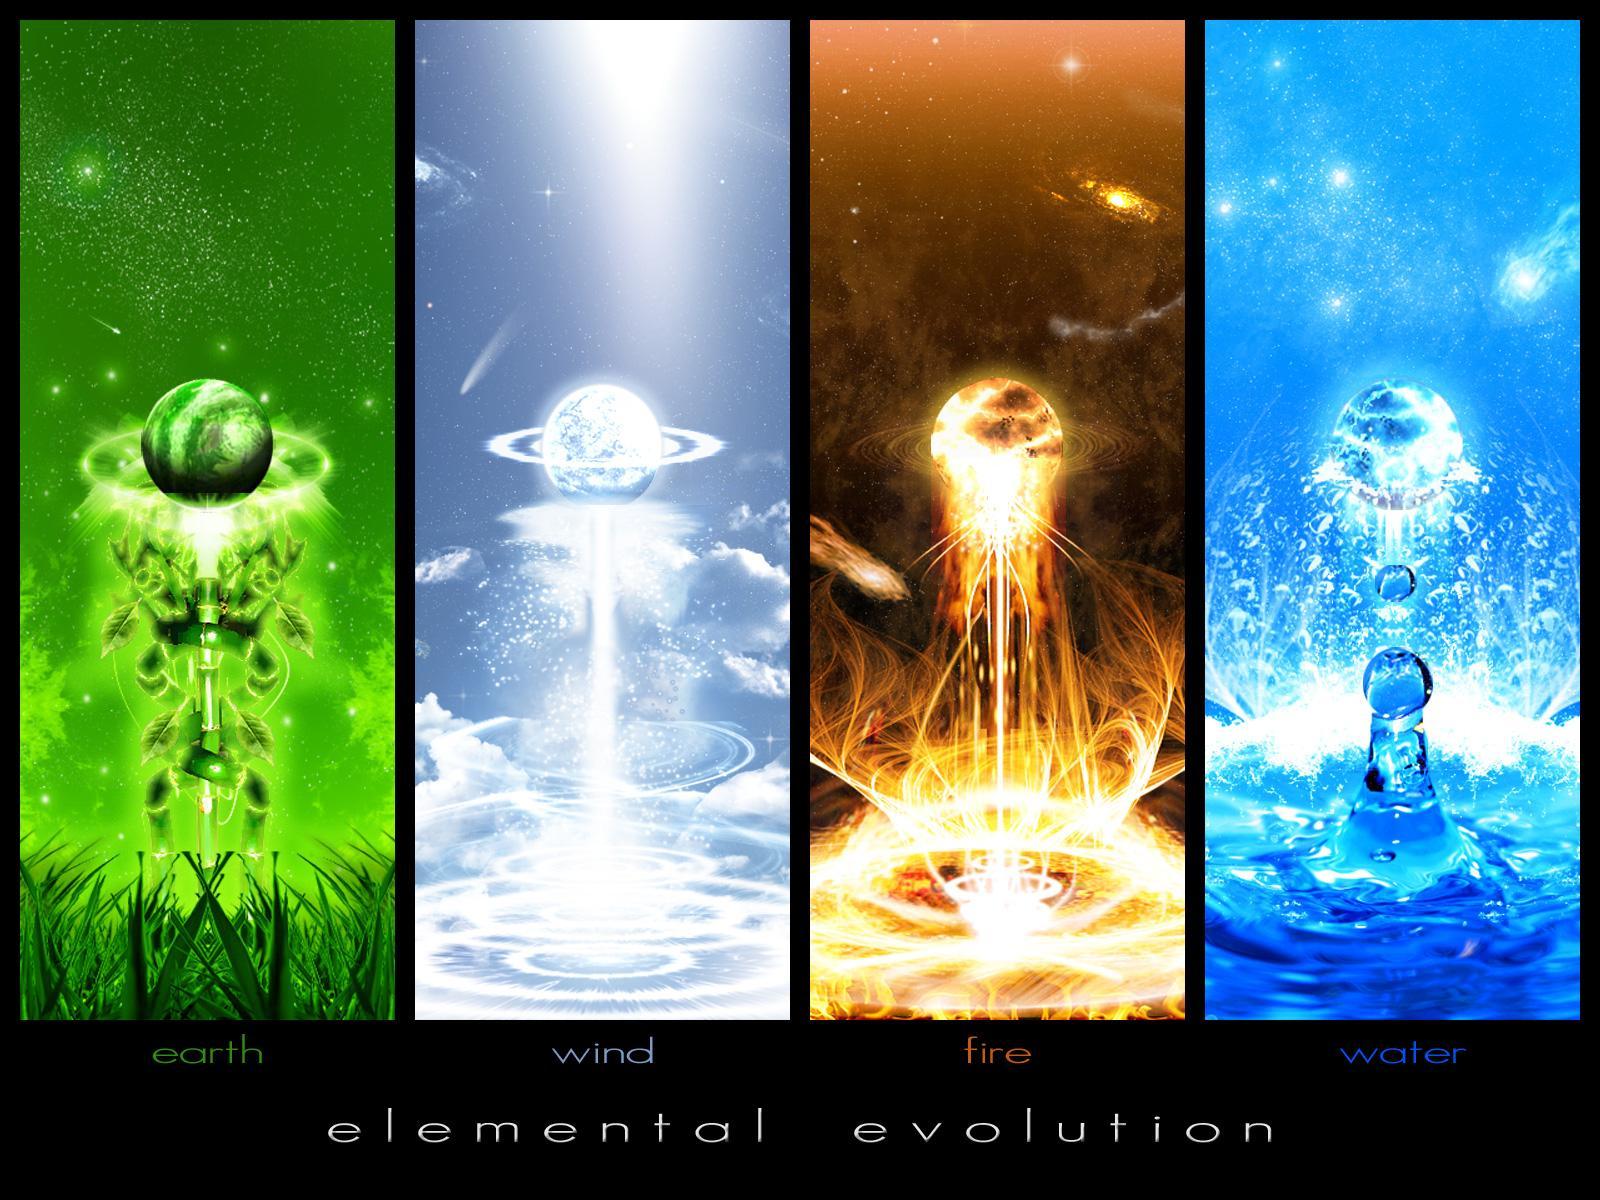 https://1.bp.blogspot.com/_W1ueYt1O3xs/R1PutEKztCI/AAAAAAAACuo/jReqHcZhz5c/s1600-R/Elemental_Evolution_by_bdotward.jpg